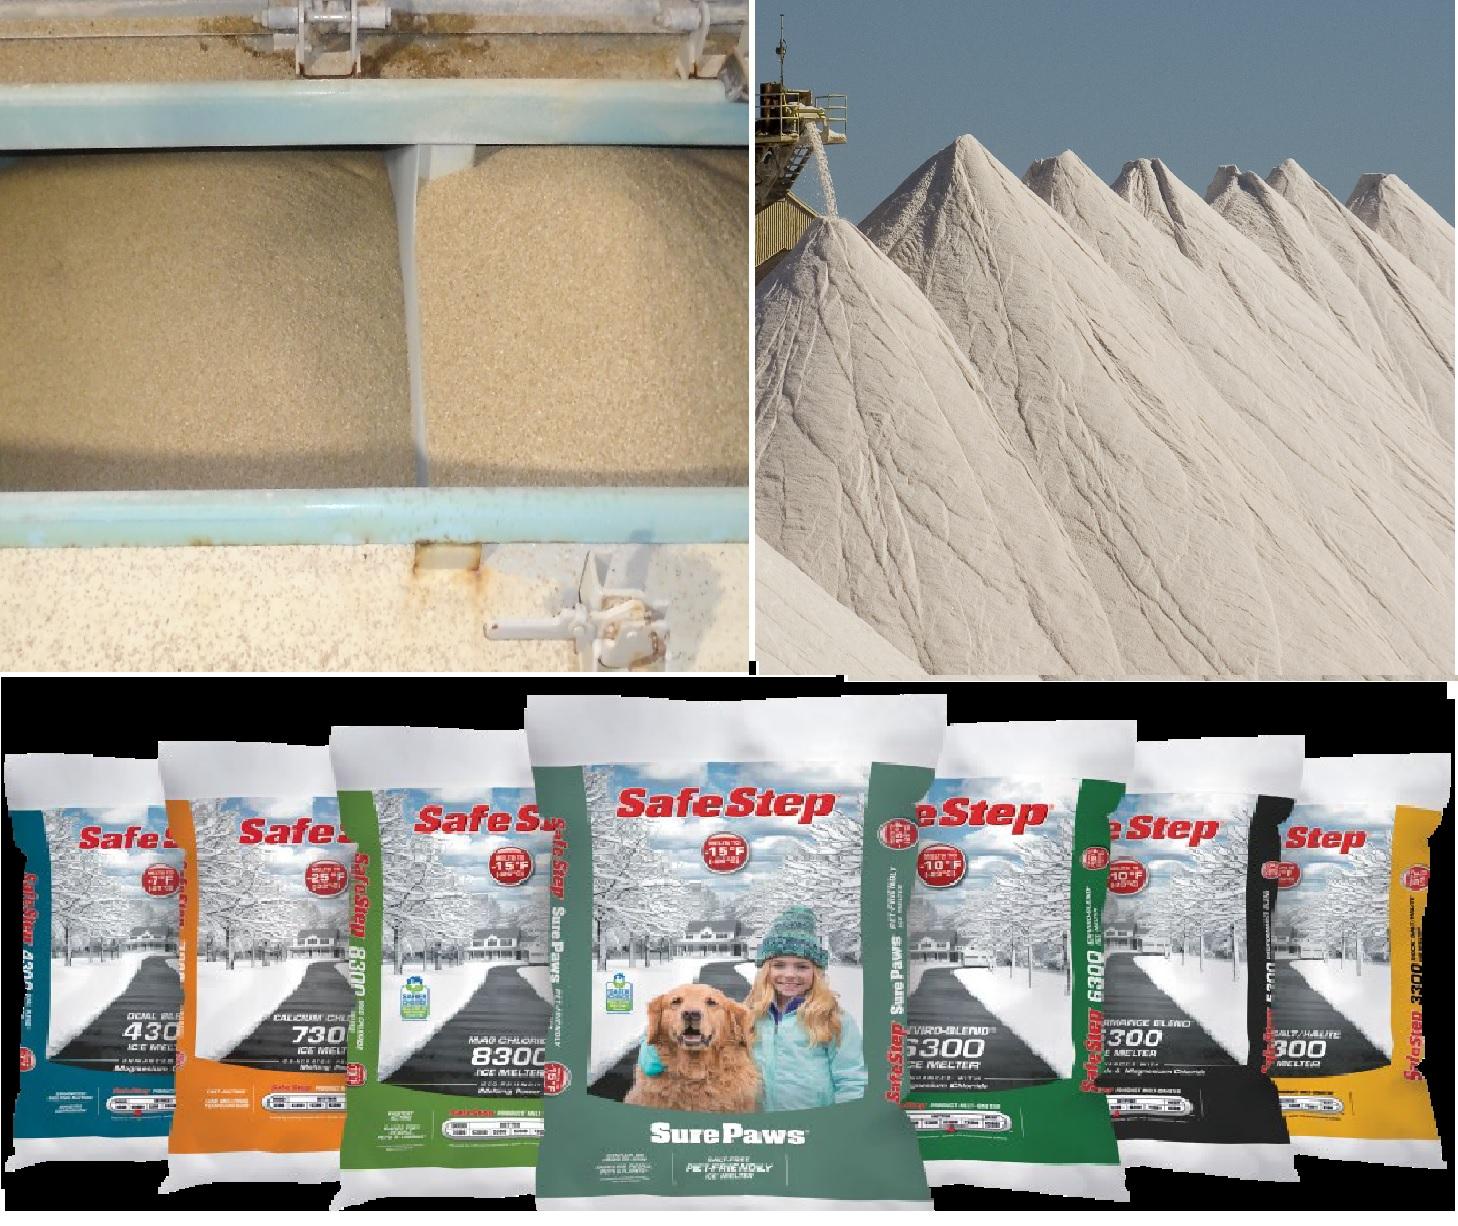 compass minerals inc salt sulfate of potash magnesium chloride